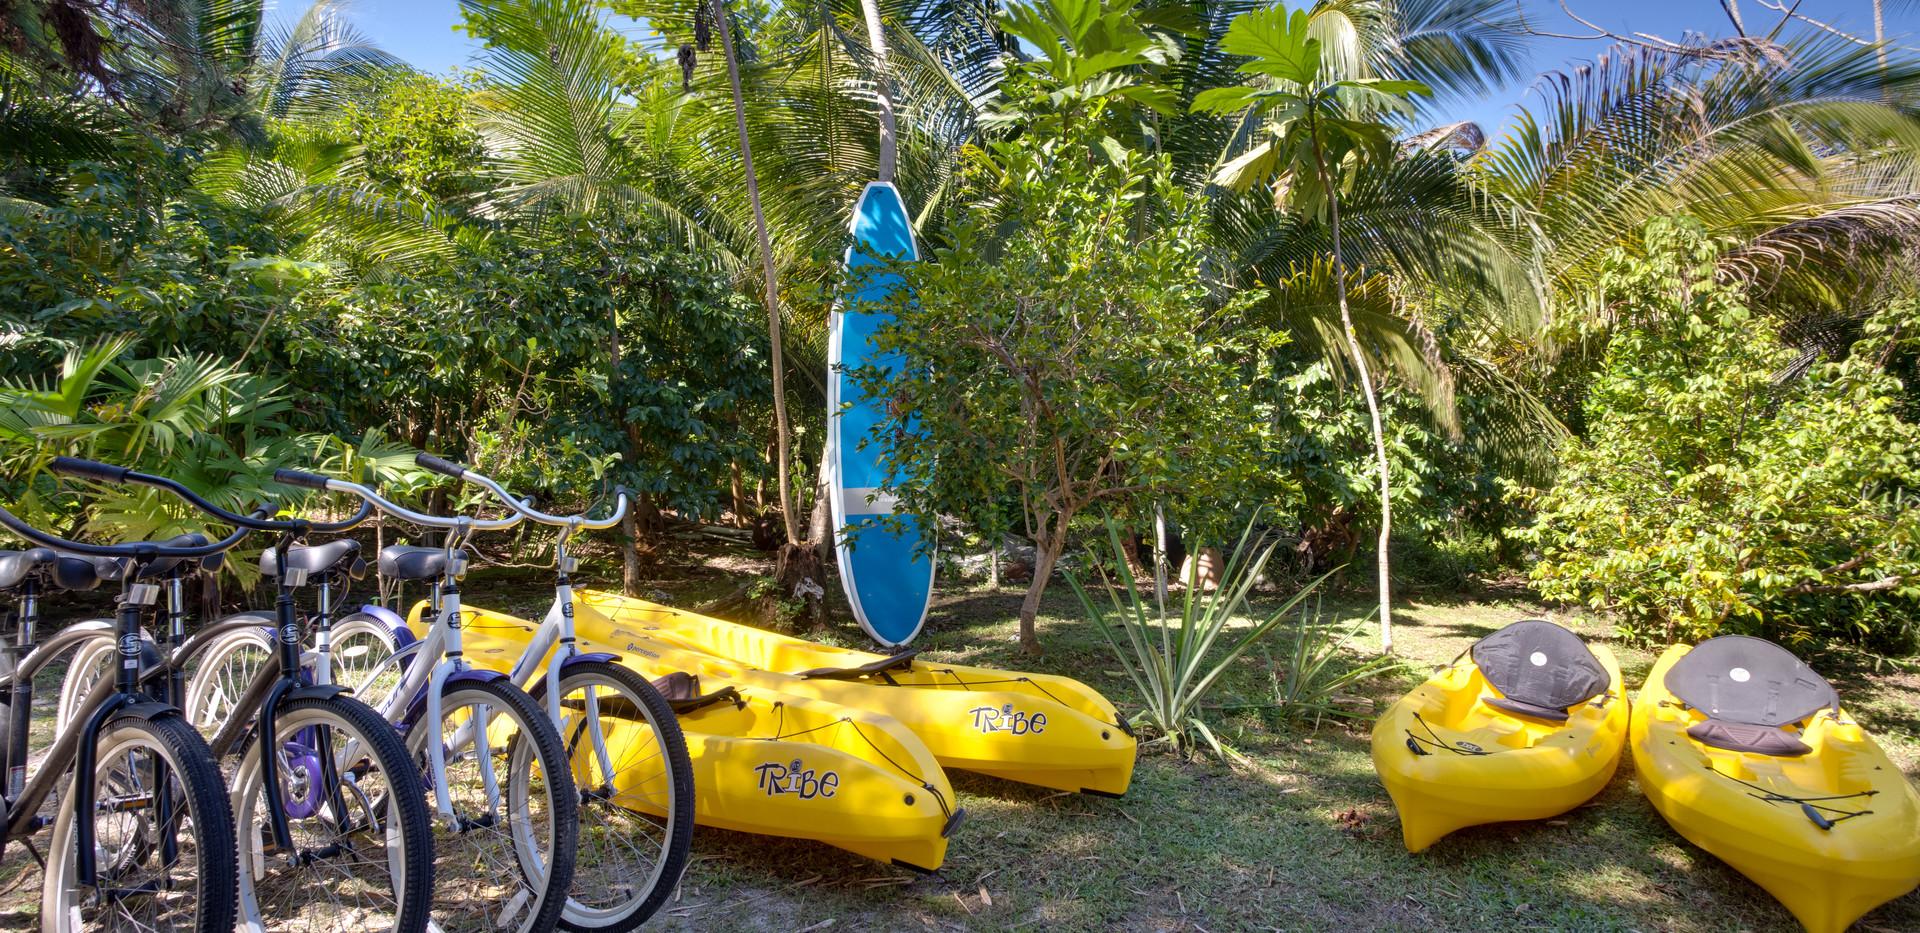 Bikes&kayaks free of charge